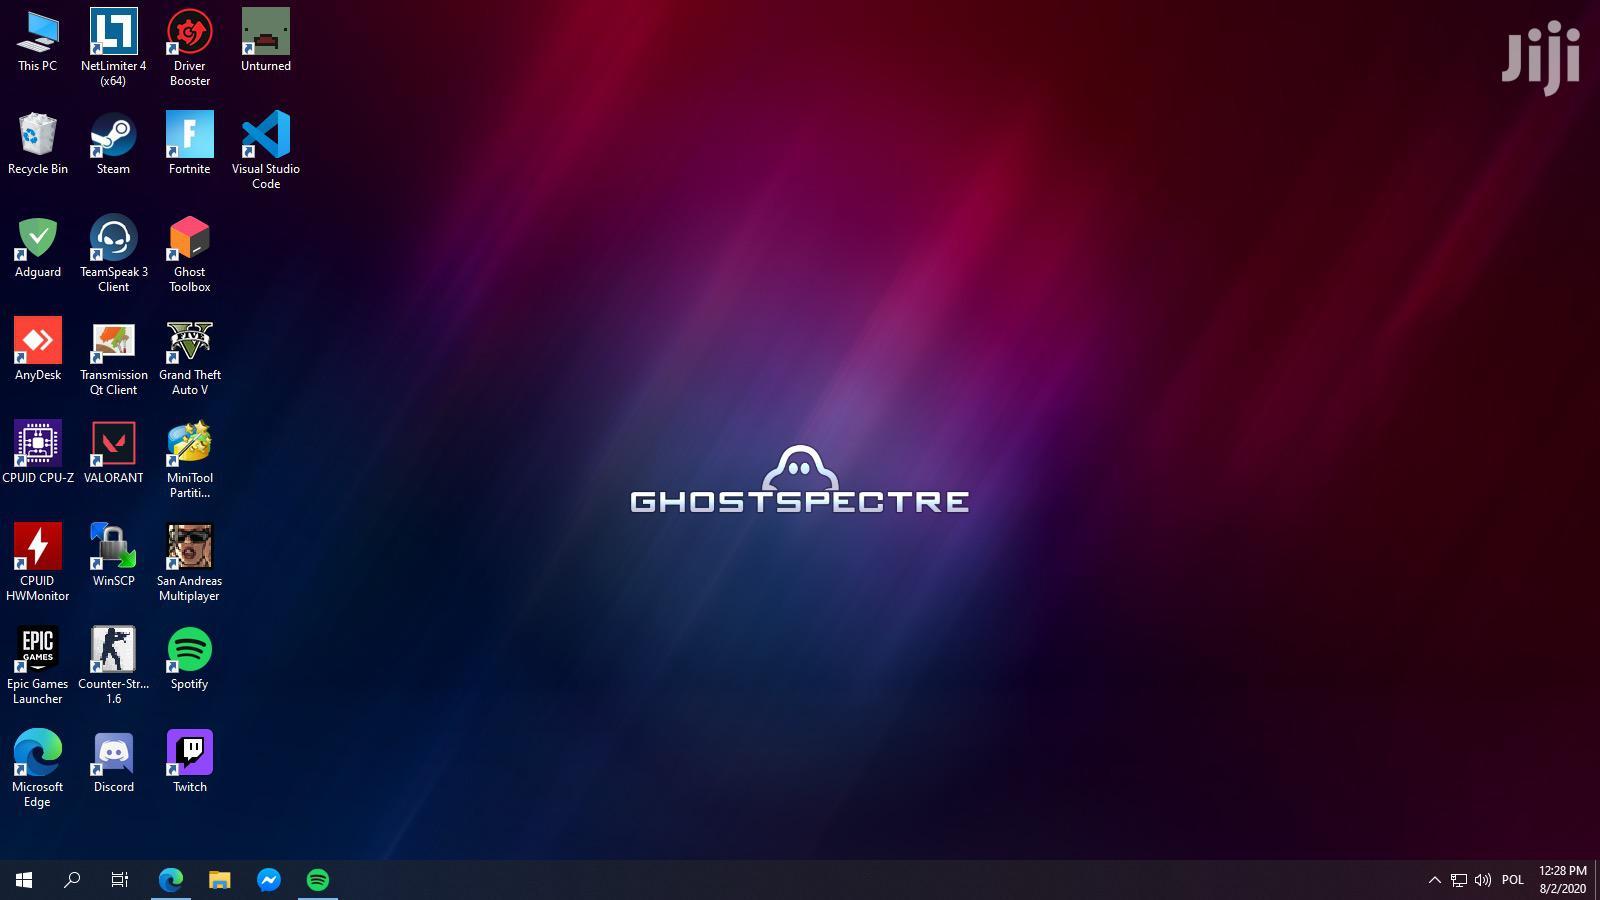 Windows 10 PRO Ghost Spectre 2021 Version 2004 64bit